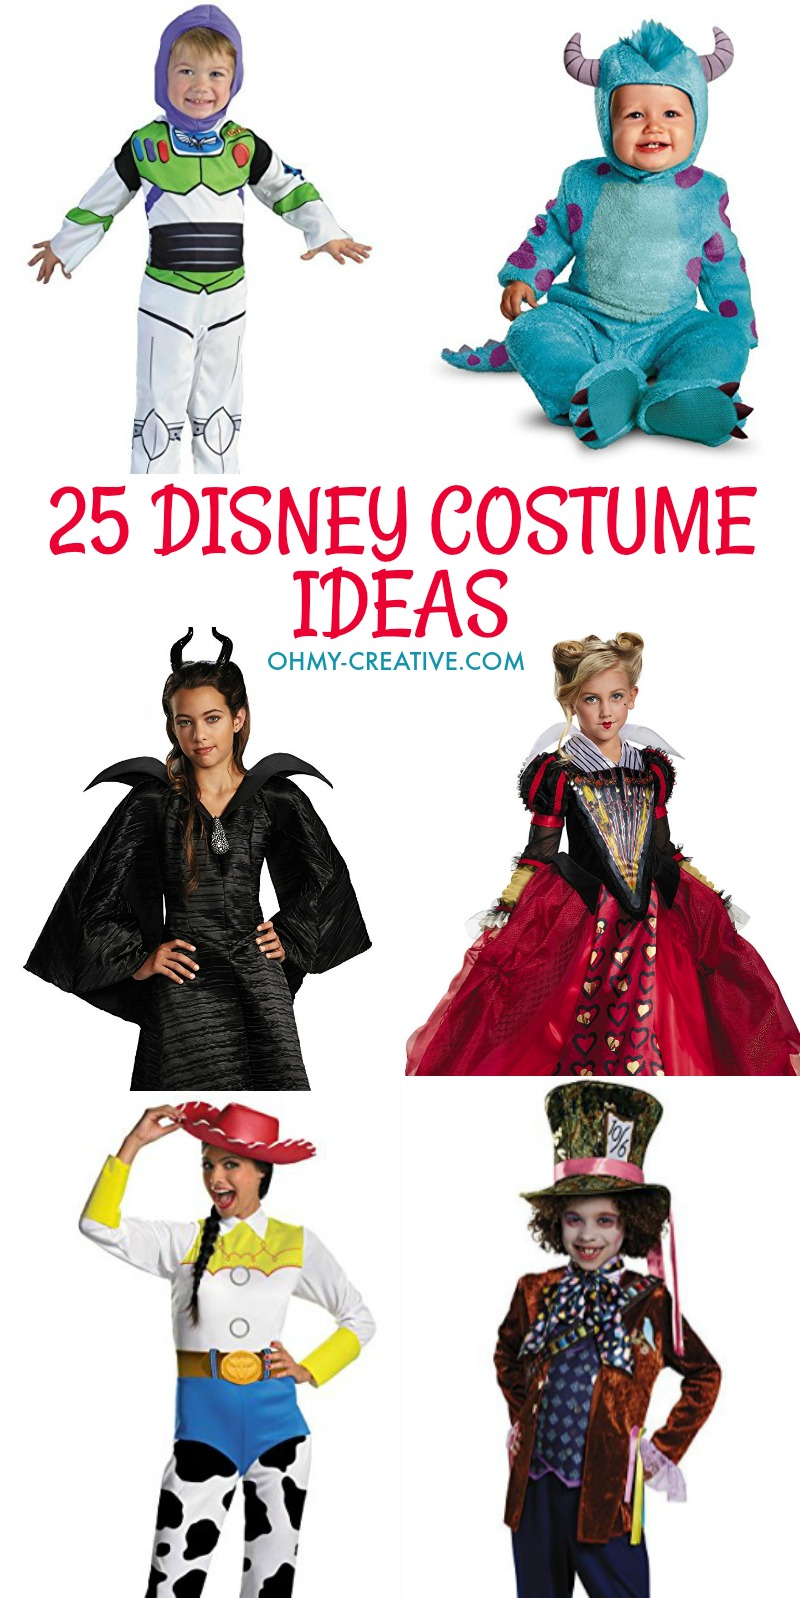 Princess Tiana Halloween Costume For Adults